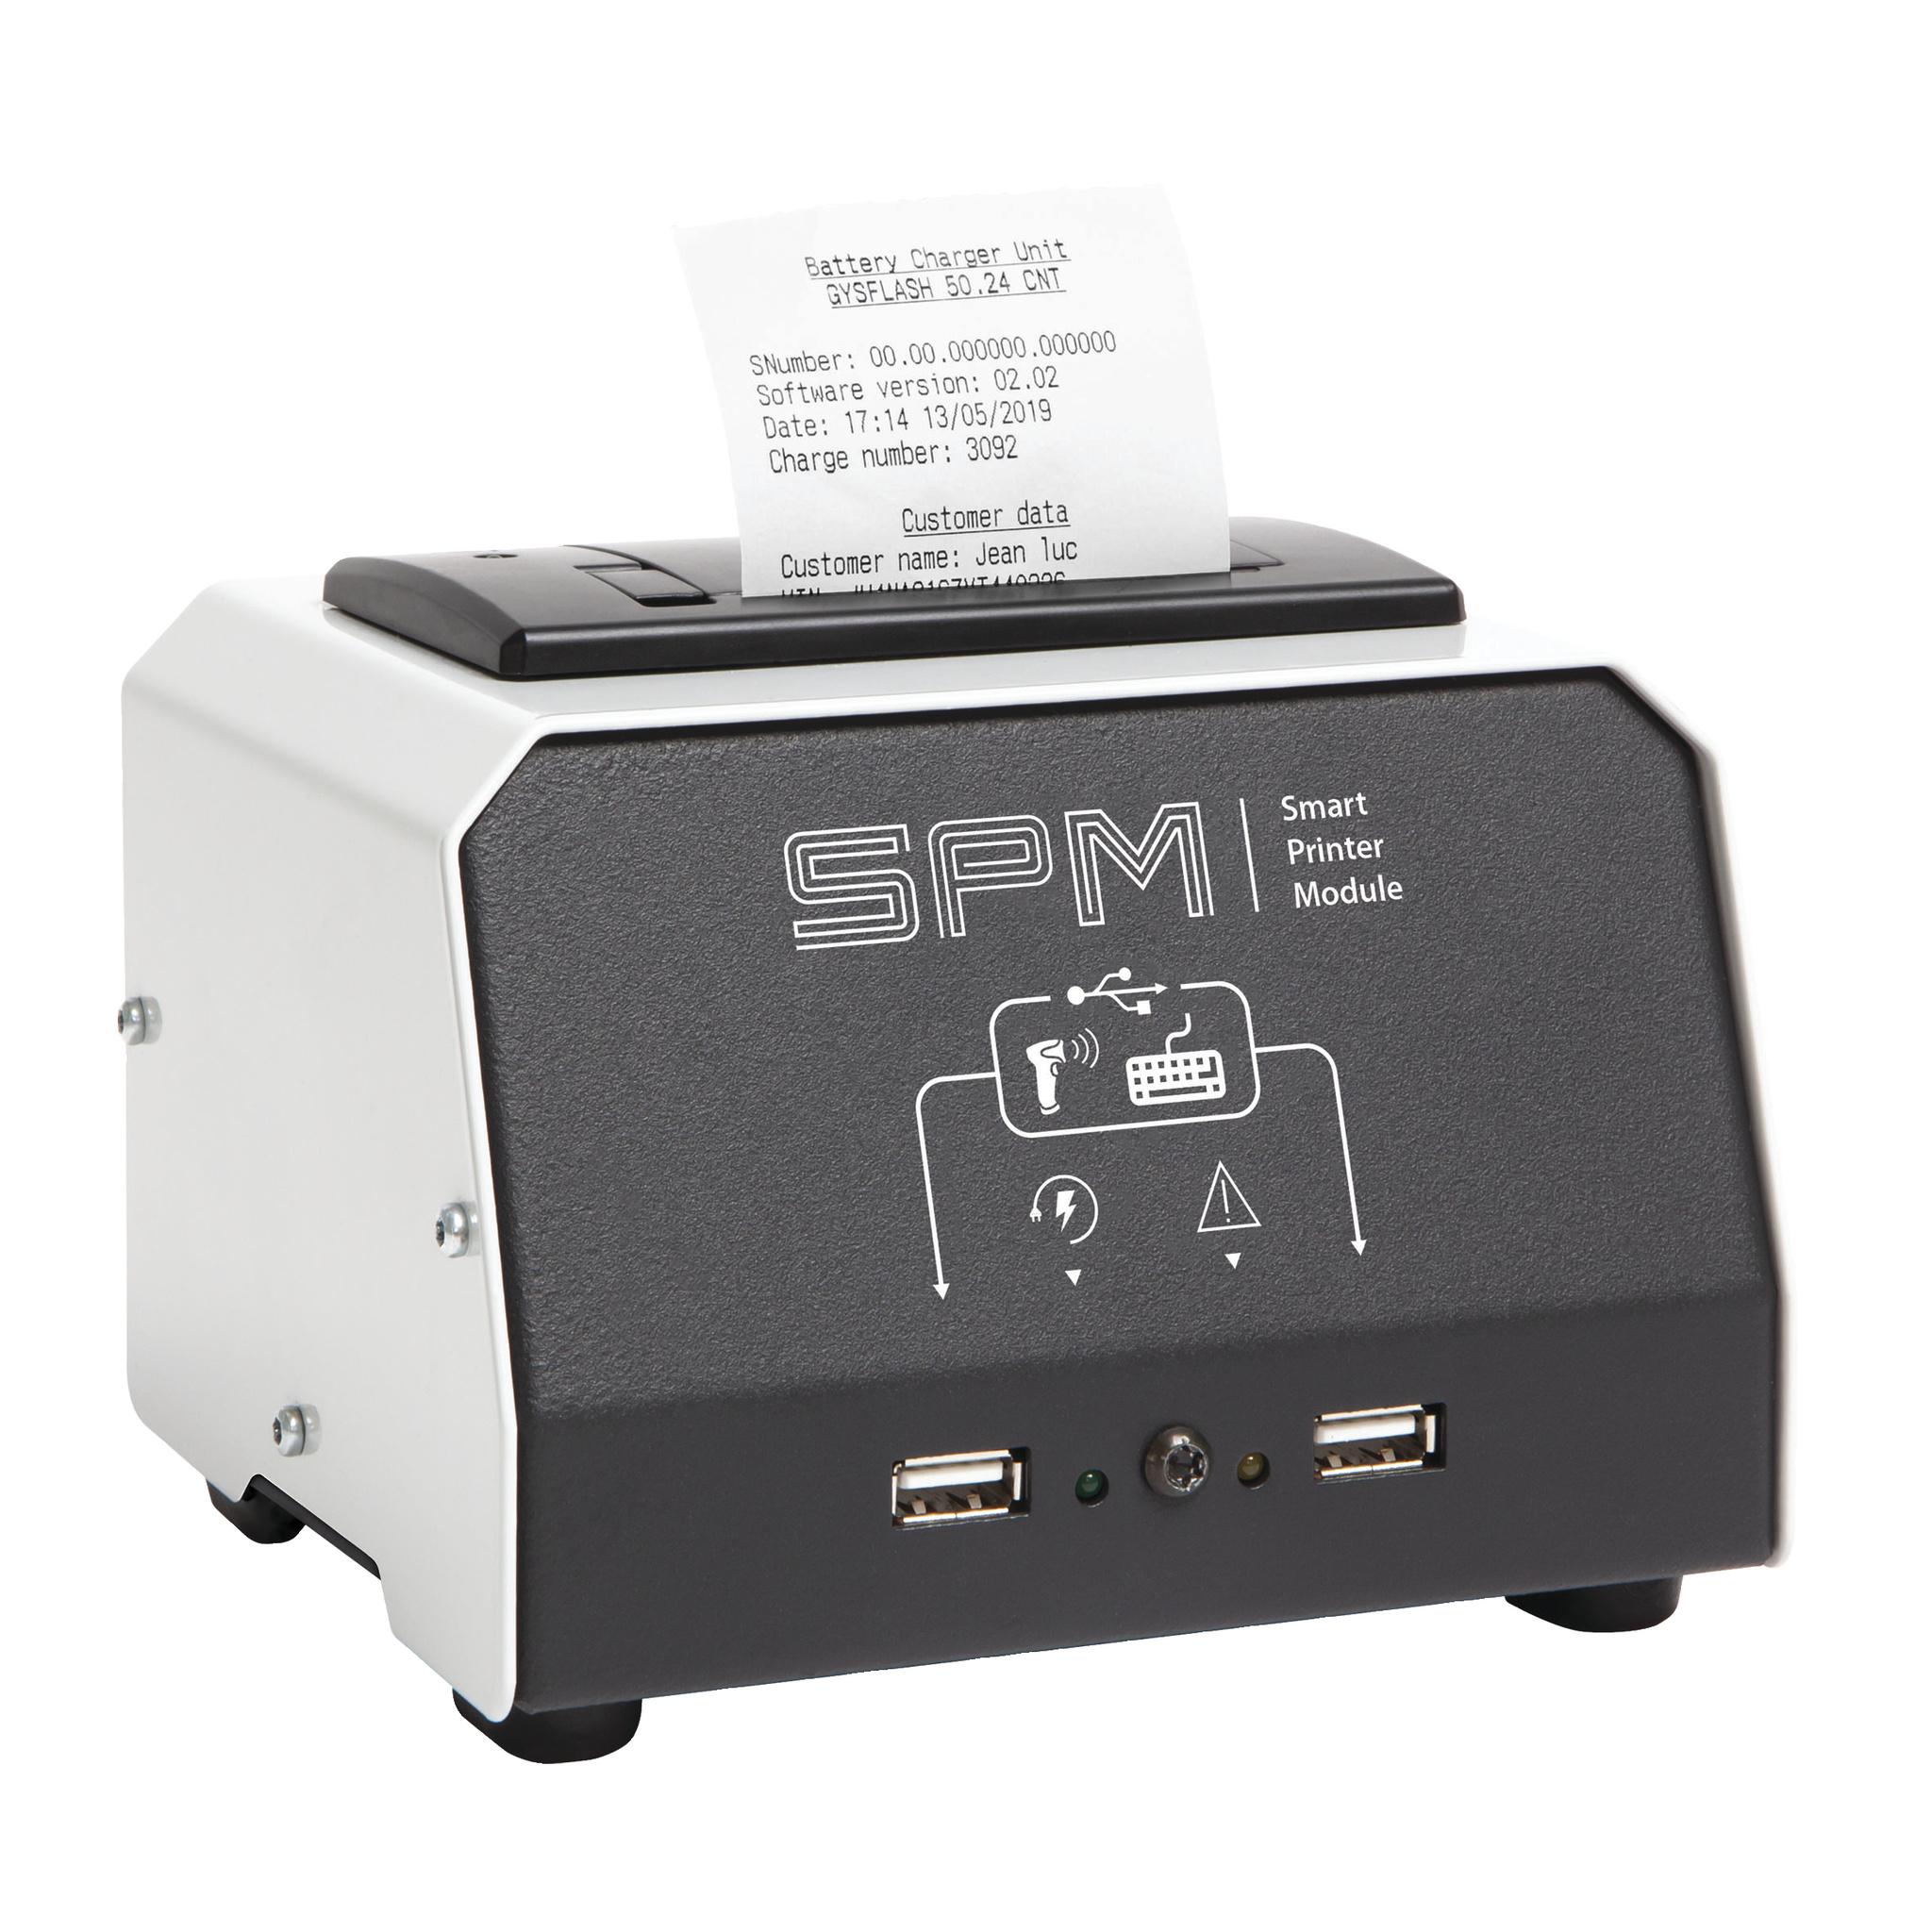 Smart Printer Module